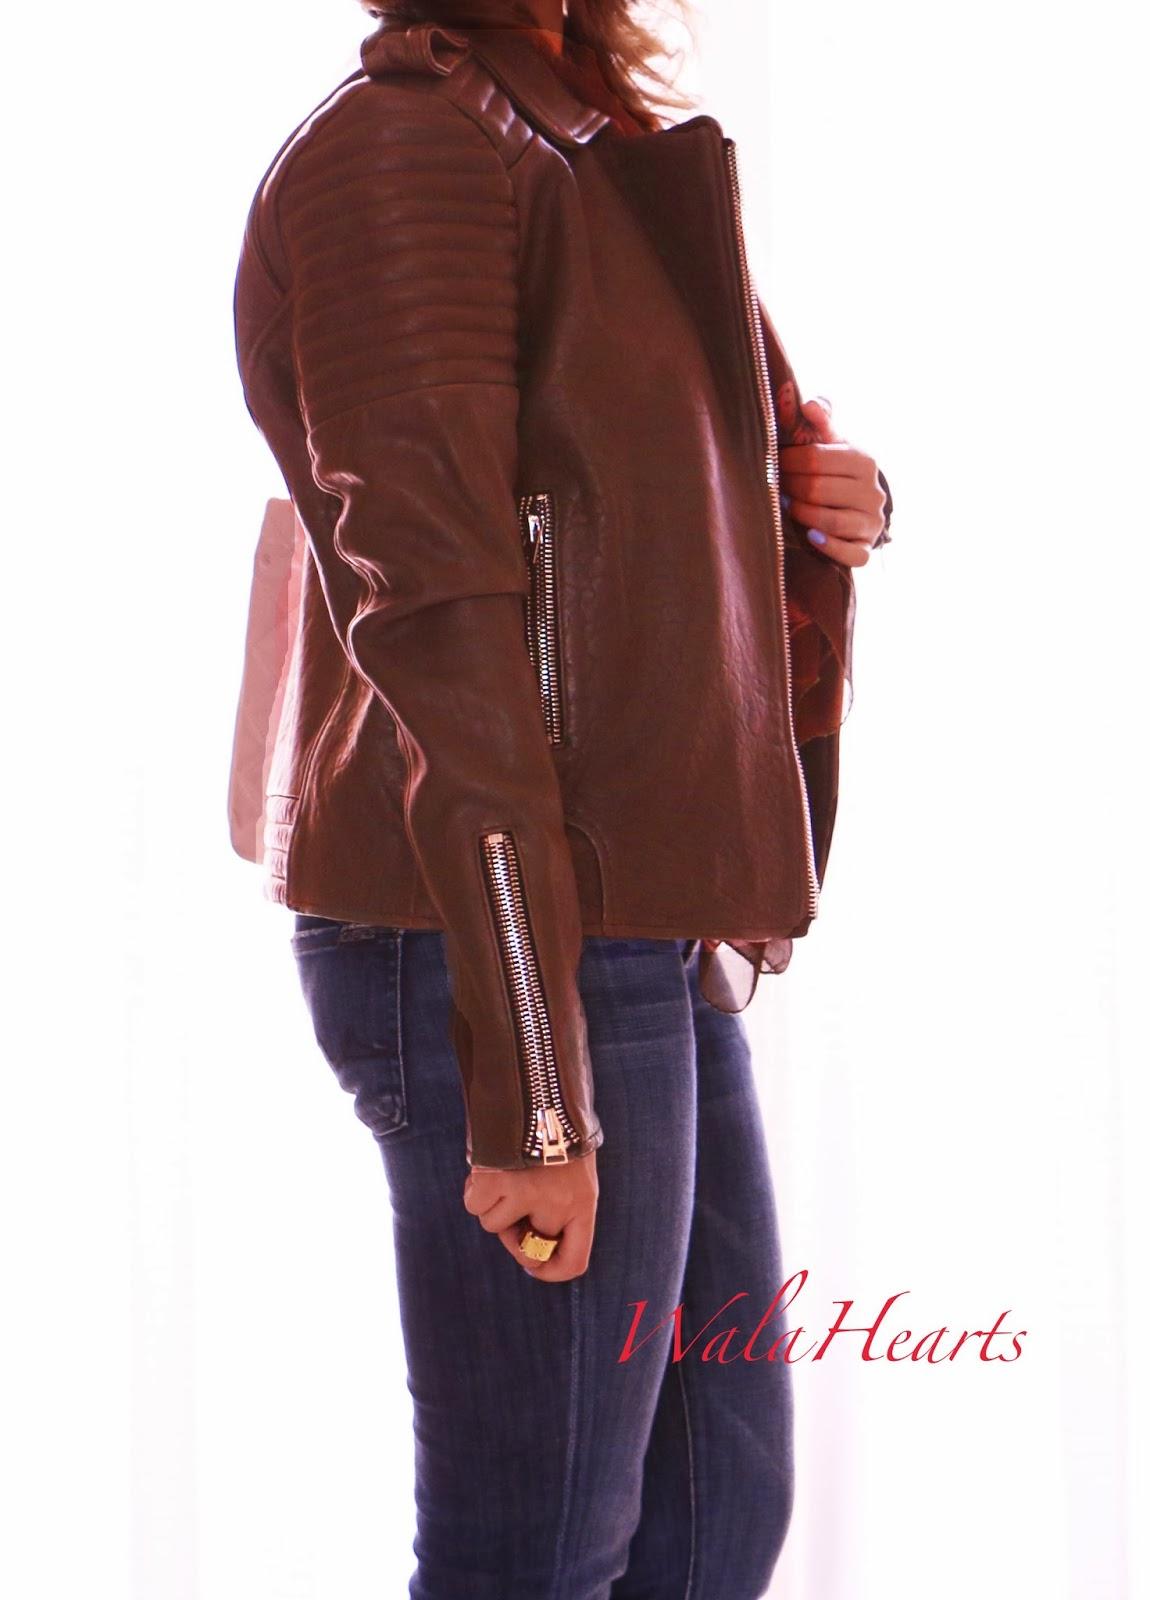 82c4bb95b OOTD: The Leather Jacket | WalaHearts | Bloglovin'